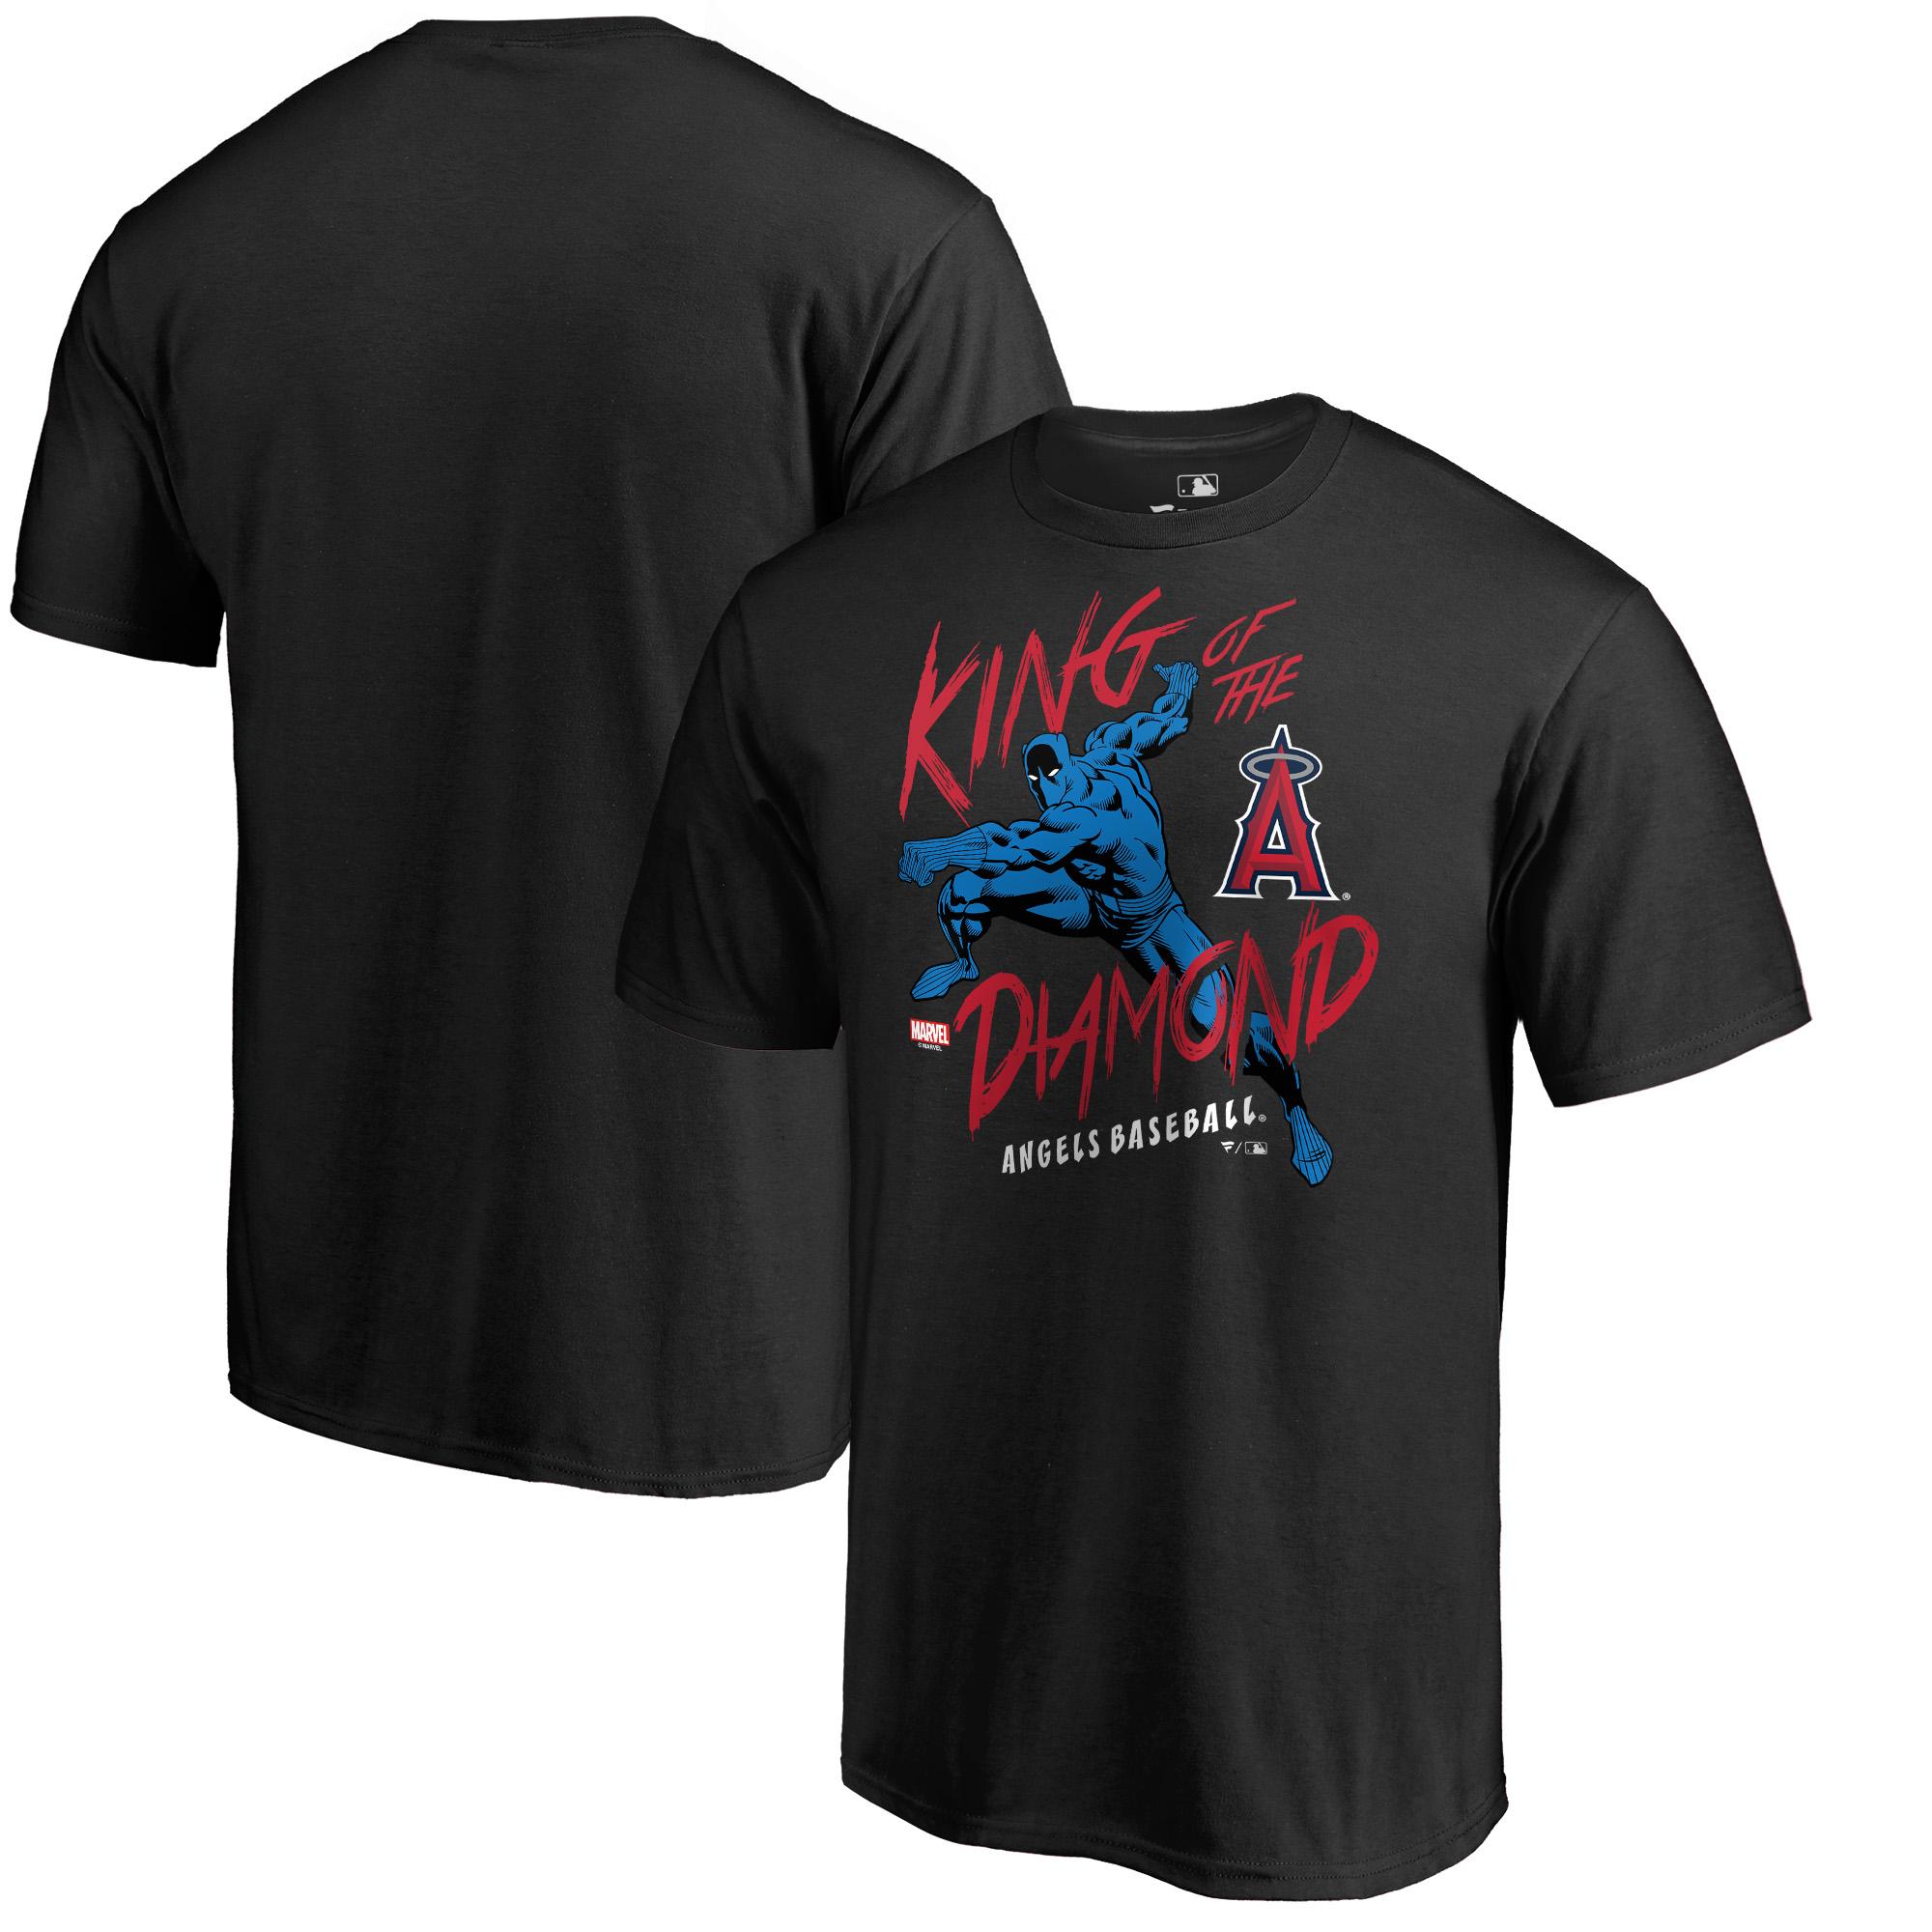 Los Angeles Angels Fanatics Branded MLB Marvel Black Panther King of the Diamond T-Shirt - Black